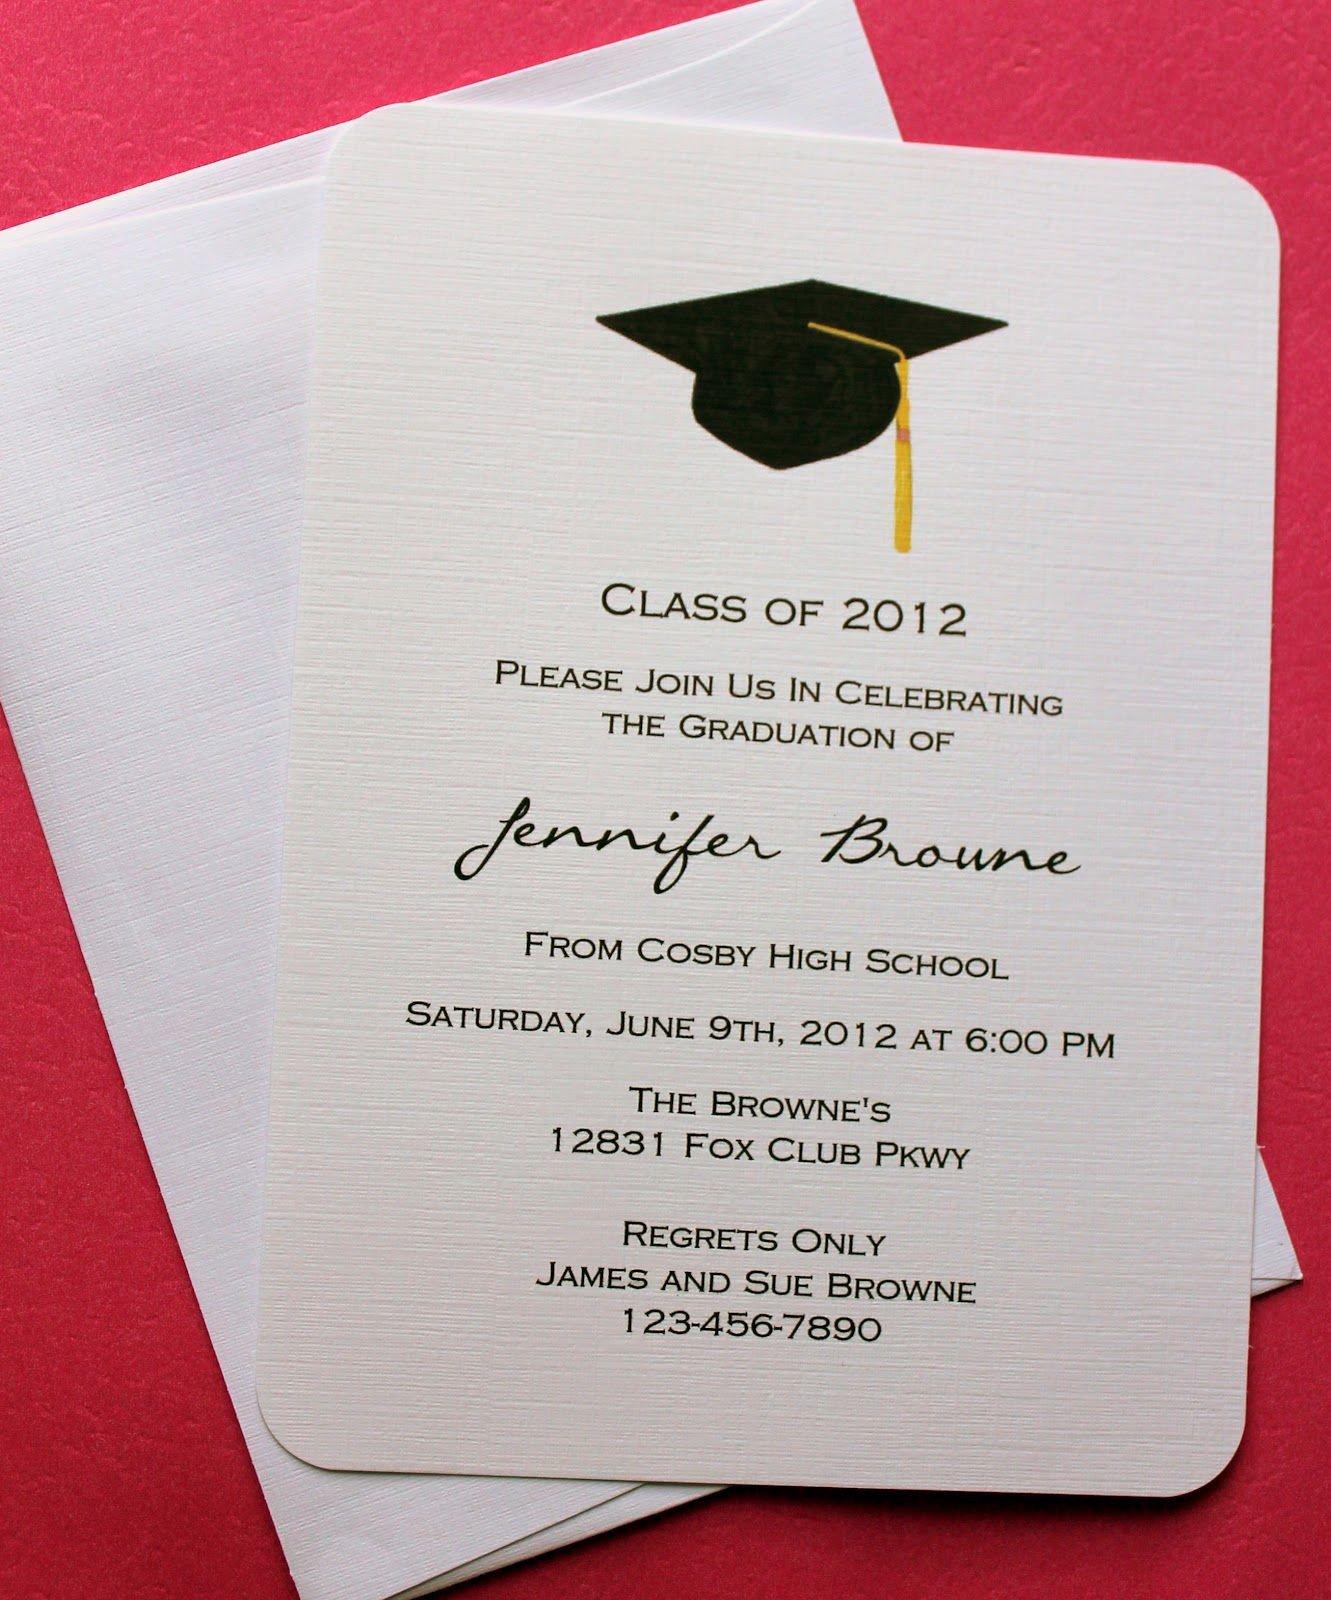 Graduation Invitation Templates Microsoft Word Graduation Invitation Template Graduation Invitation